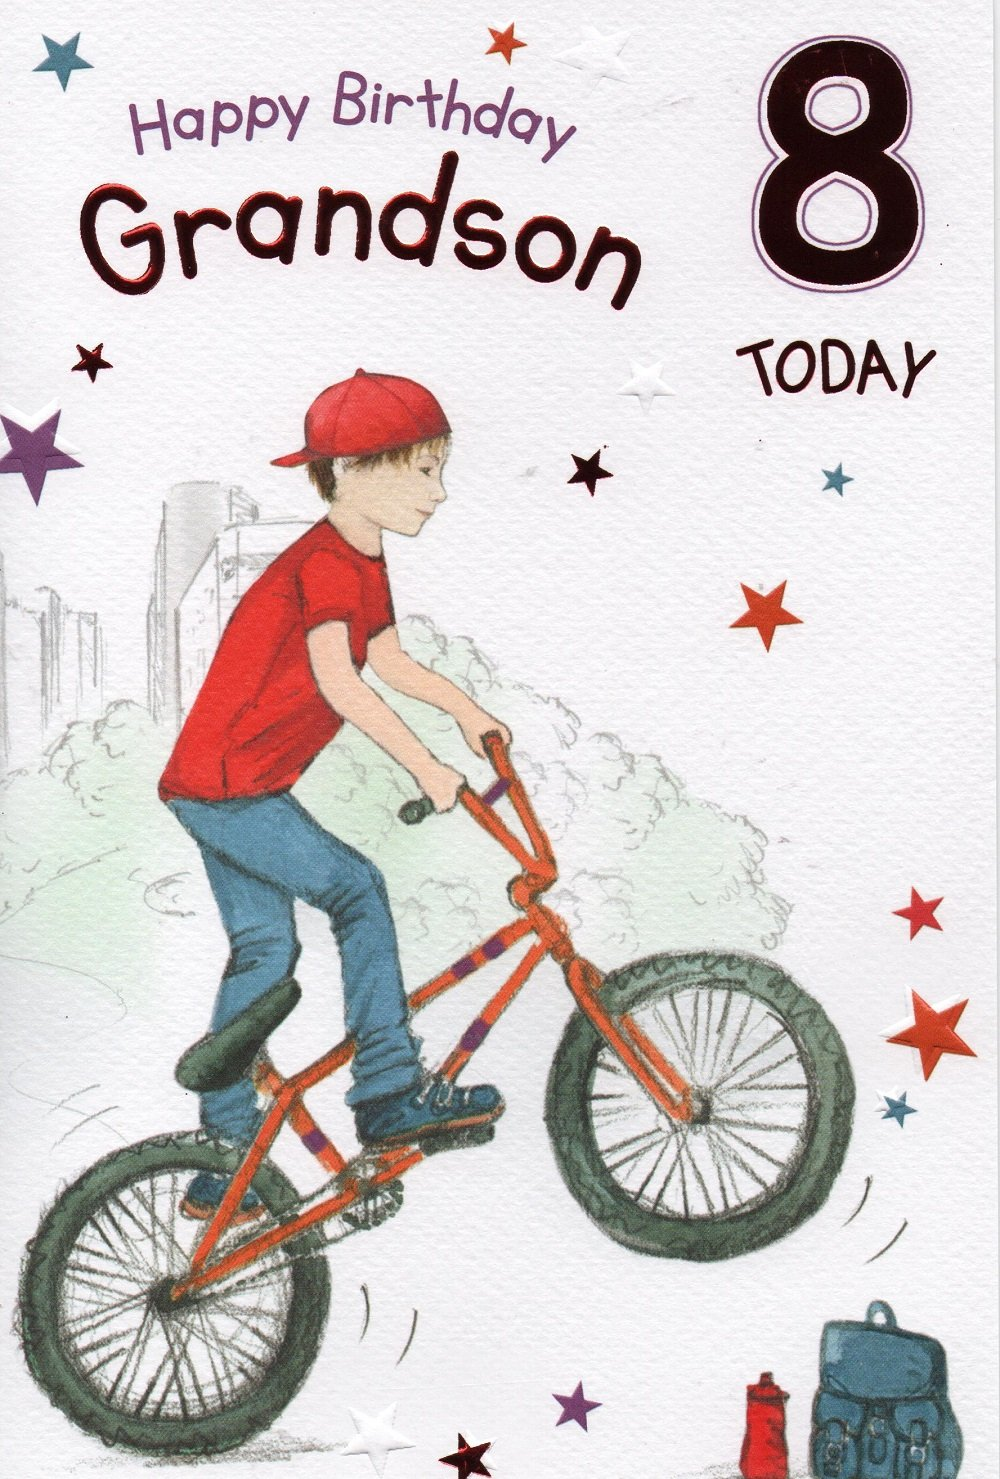 Grandson 8th birthday Card Amazoncouk Office Products – Birthday Card Grandson